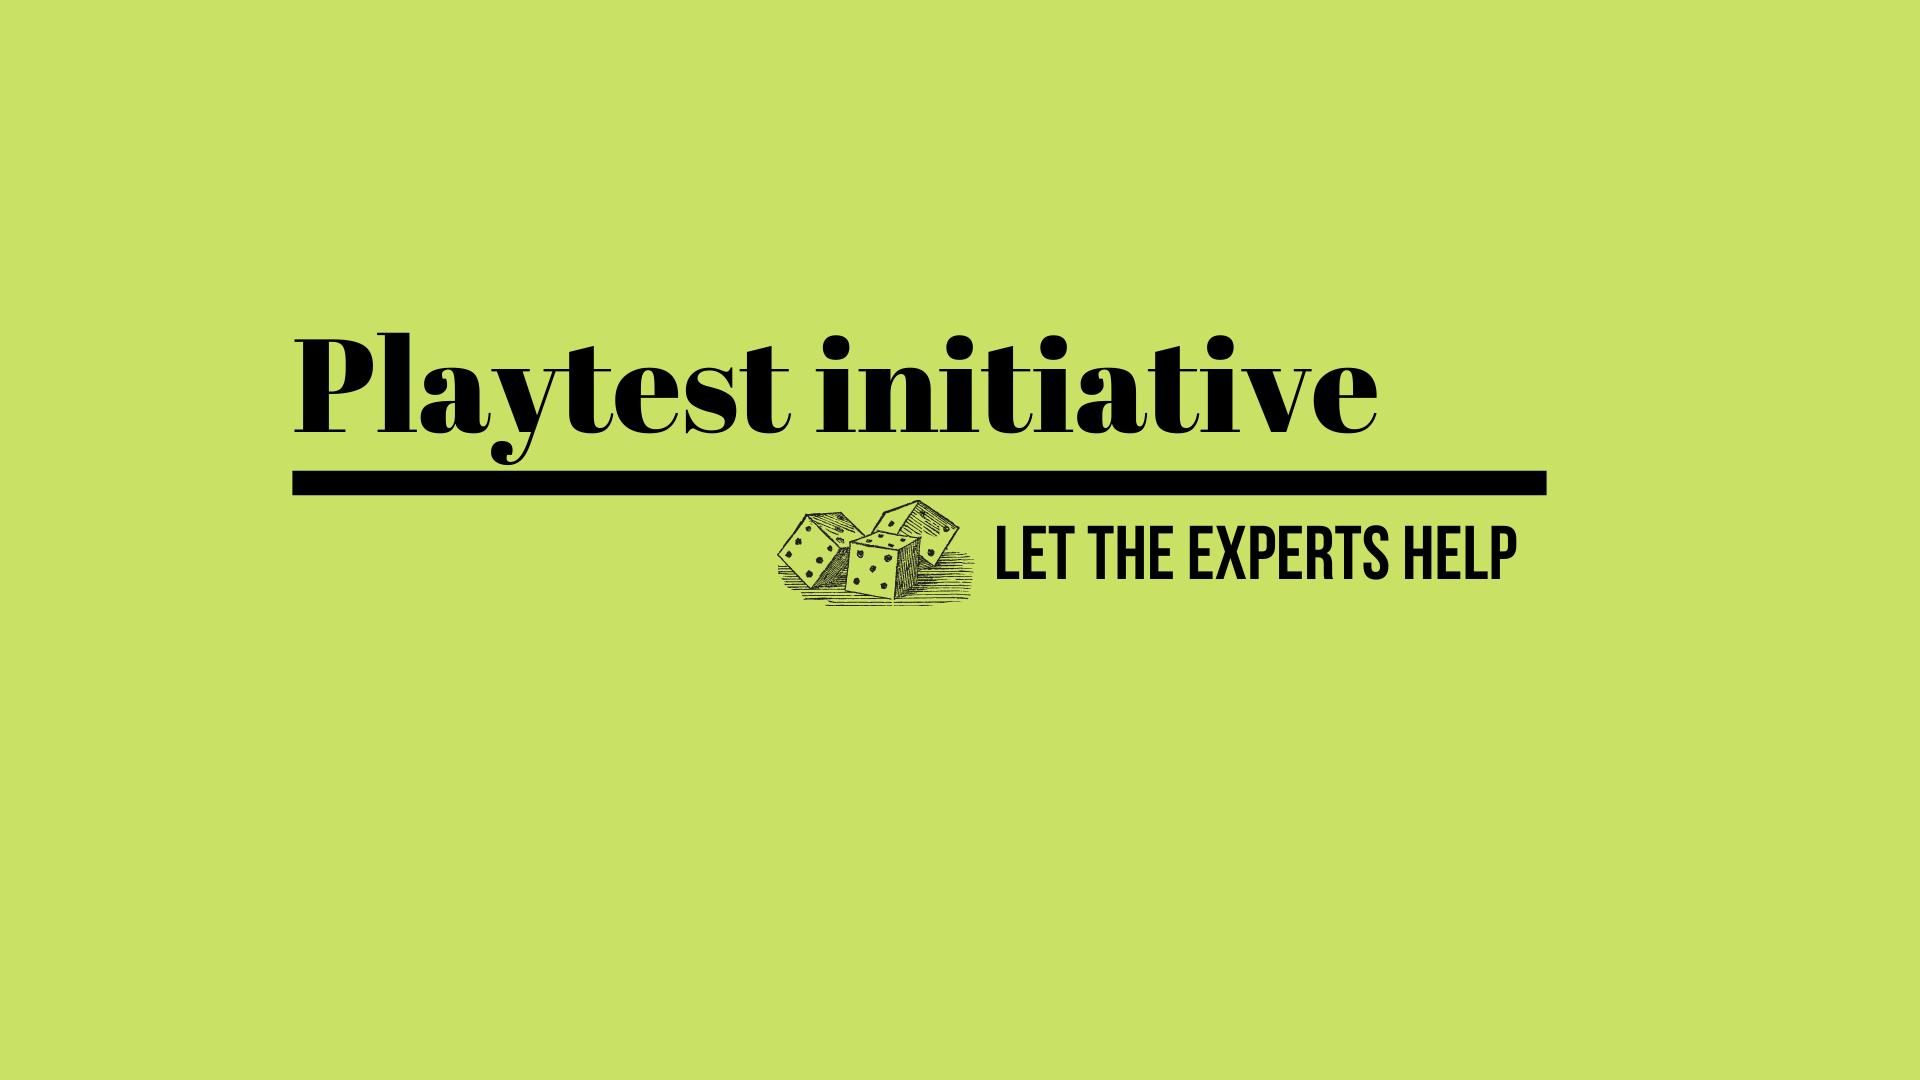 Playtest Initiative